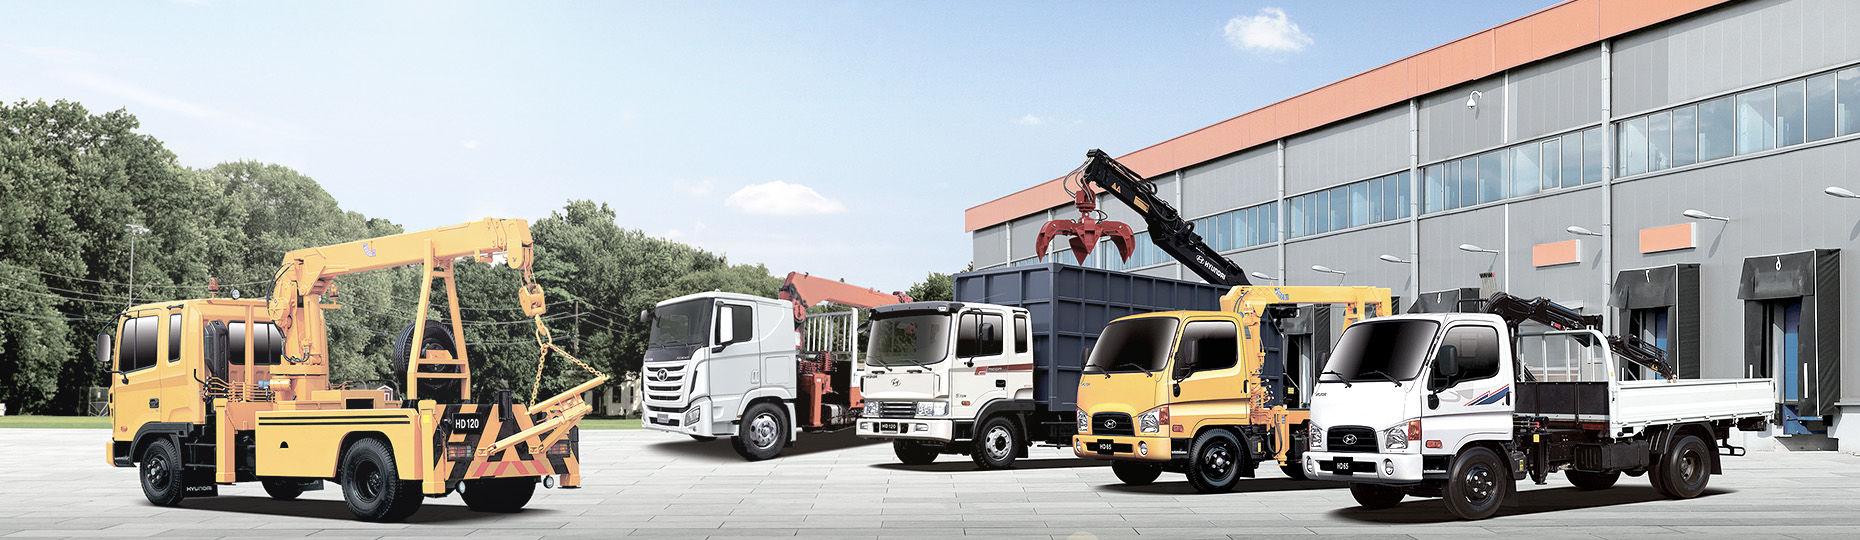 crane truck knuckle crane